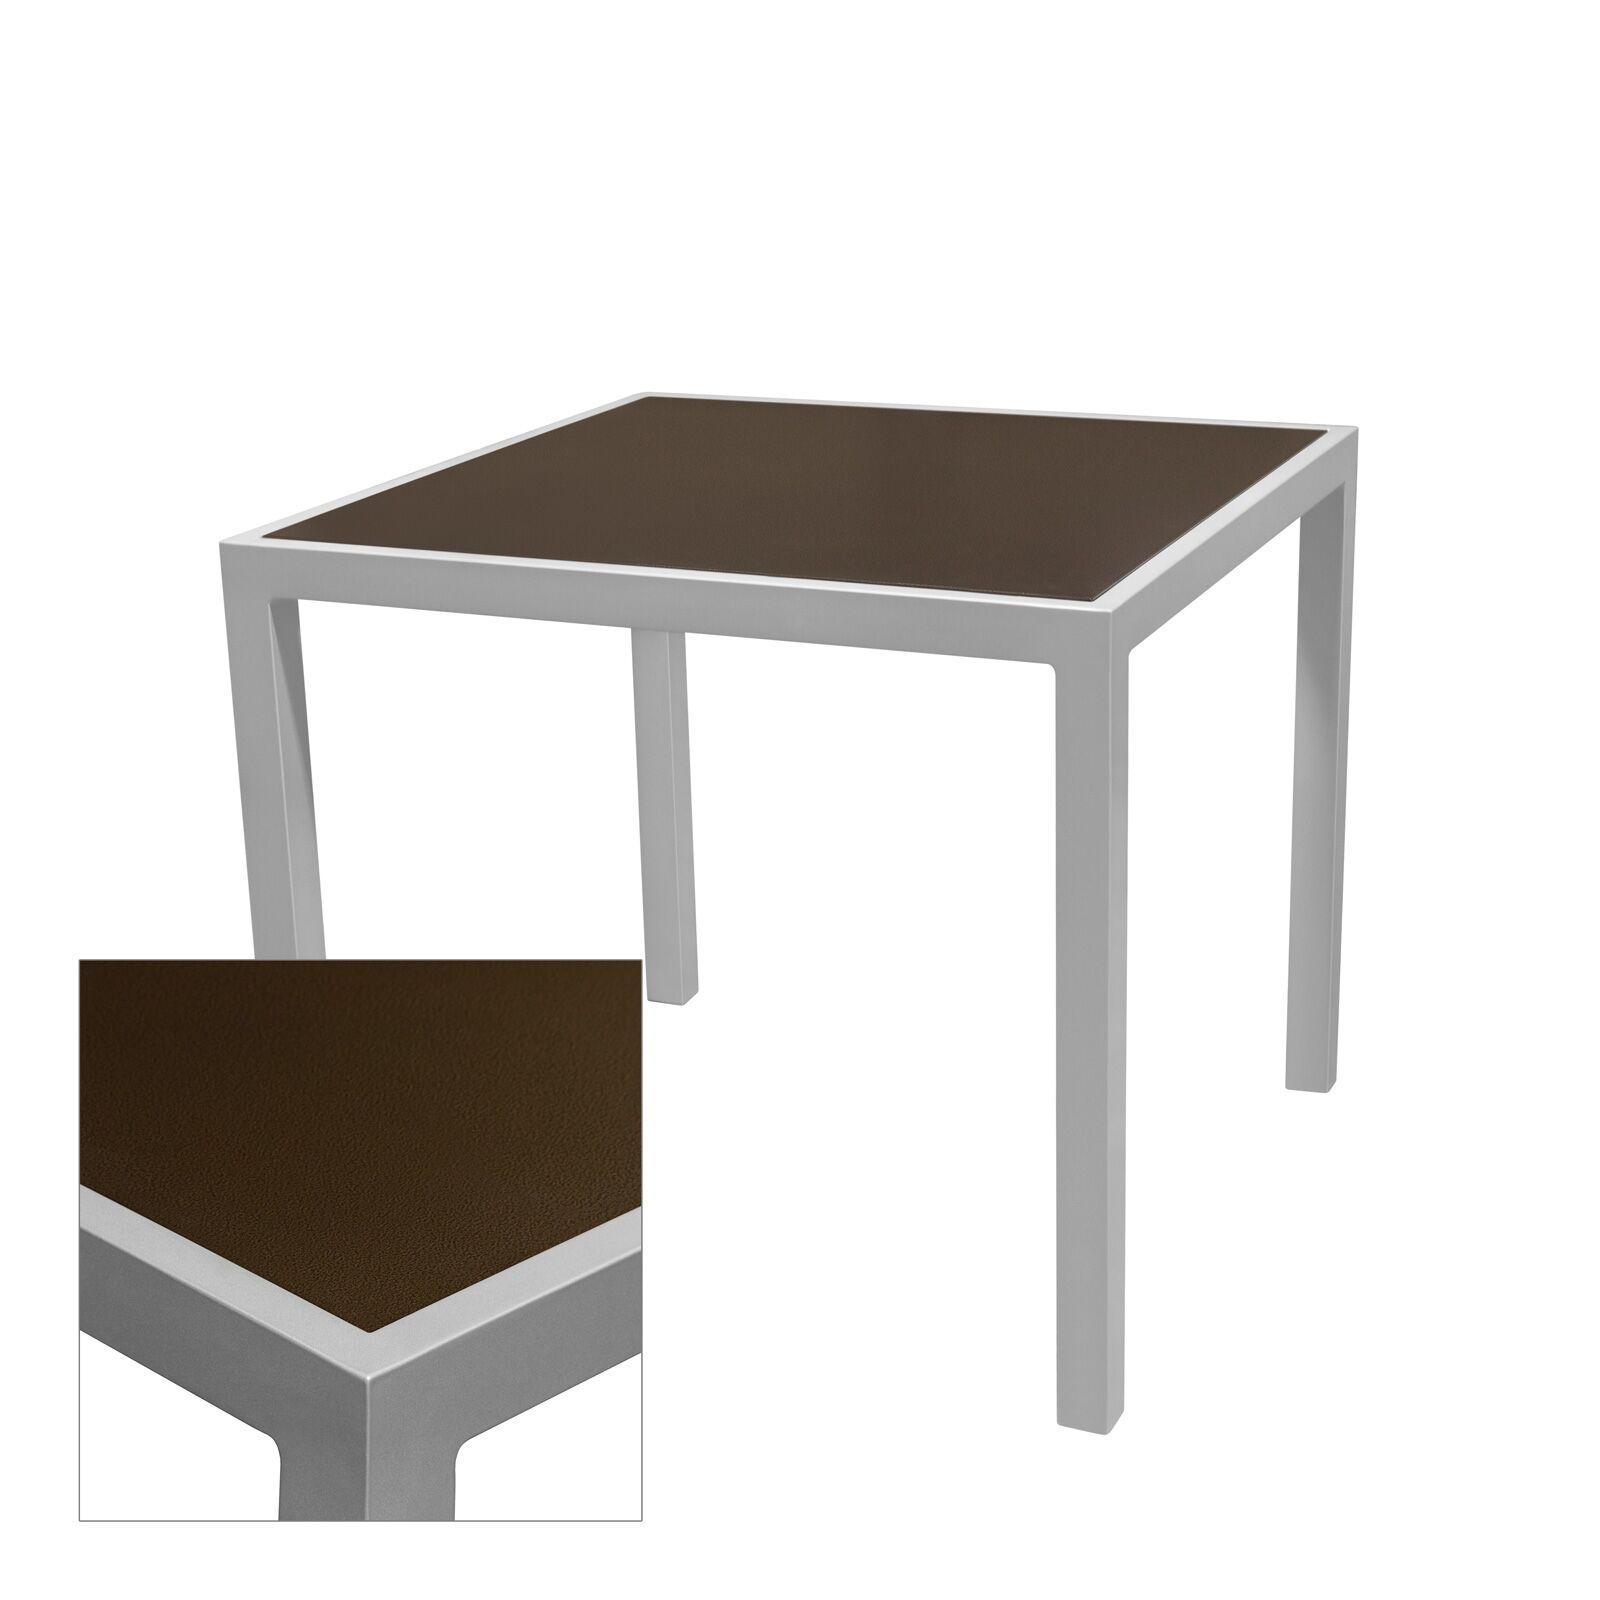 Corsa Bar Table Table Size: 24